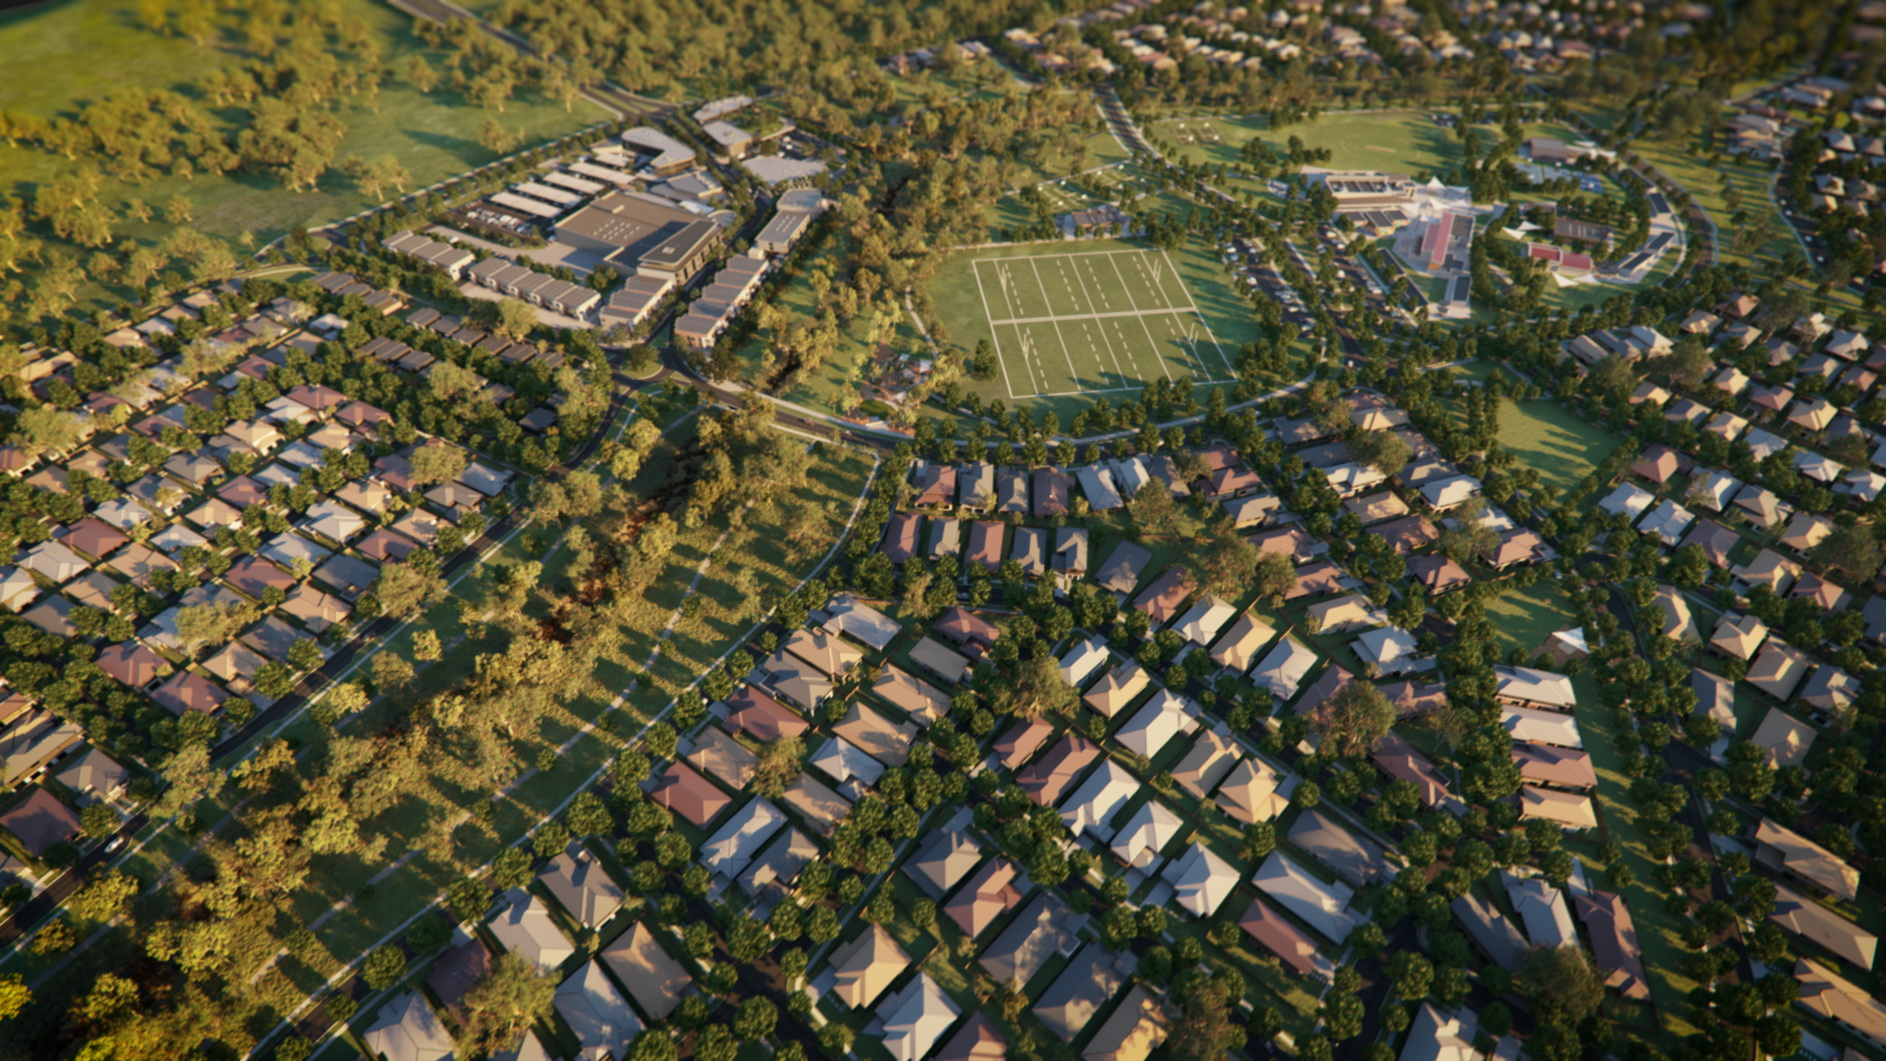 FKD-studio-3D-masterplan-image-visualisation-exterior-3d-render-aerial-masterplan-aerial